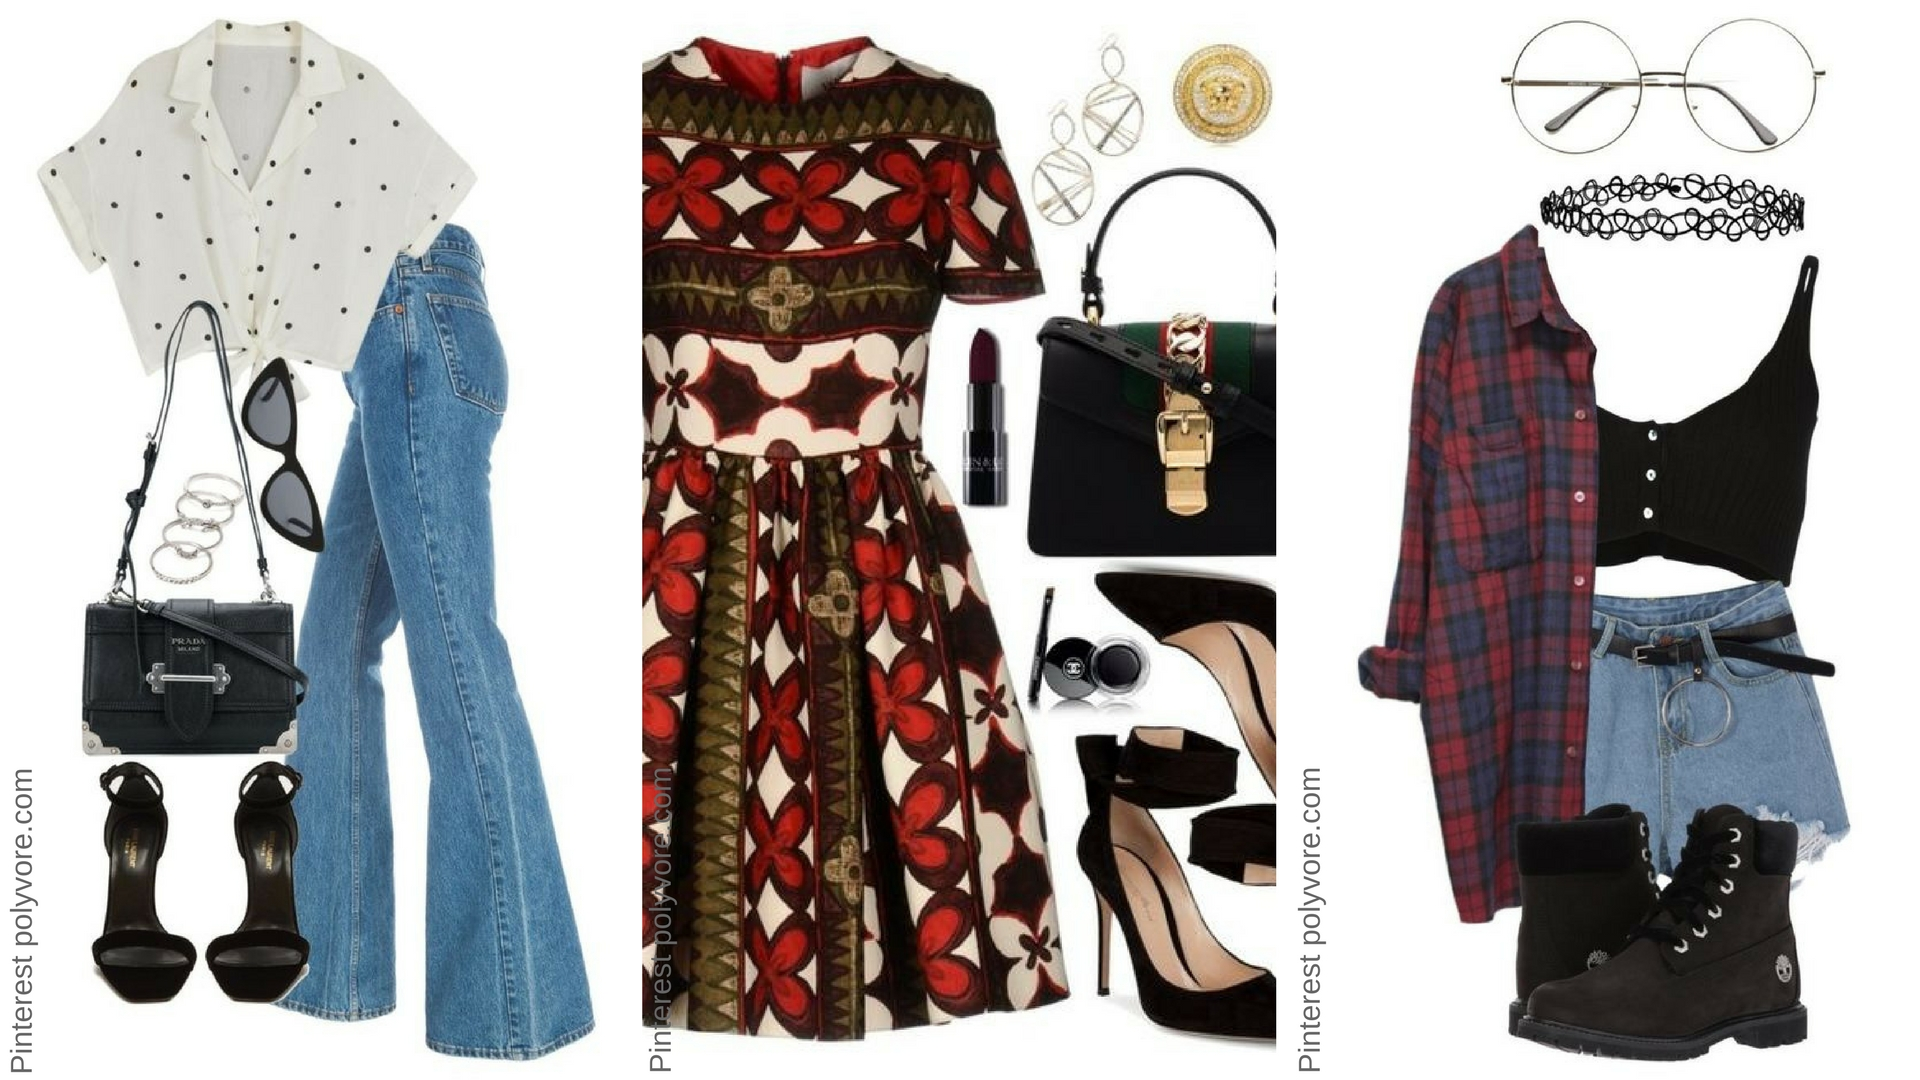 Conheça seu estilo para arrasar nas compras gastando pouco